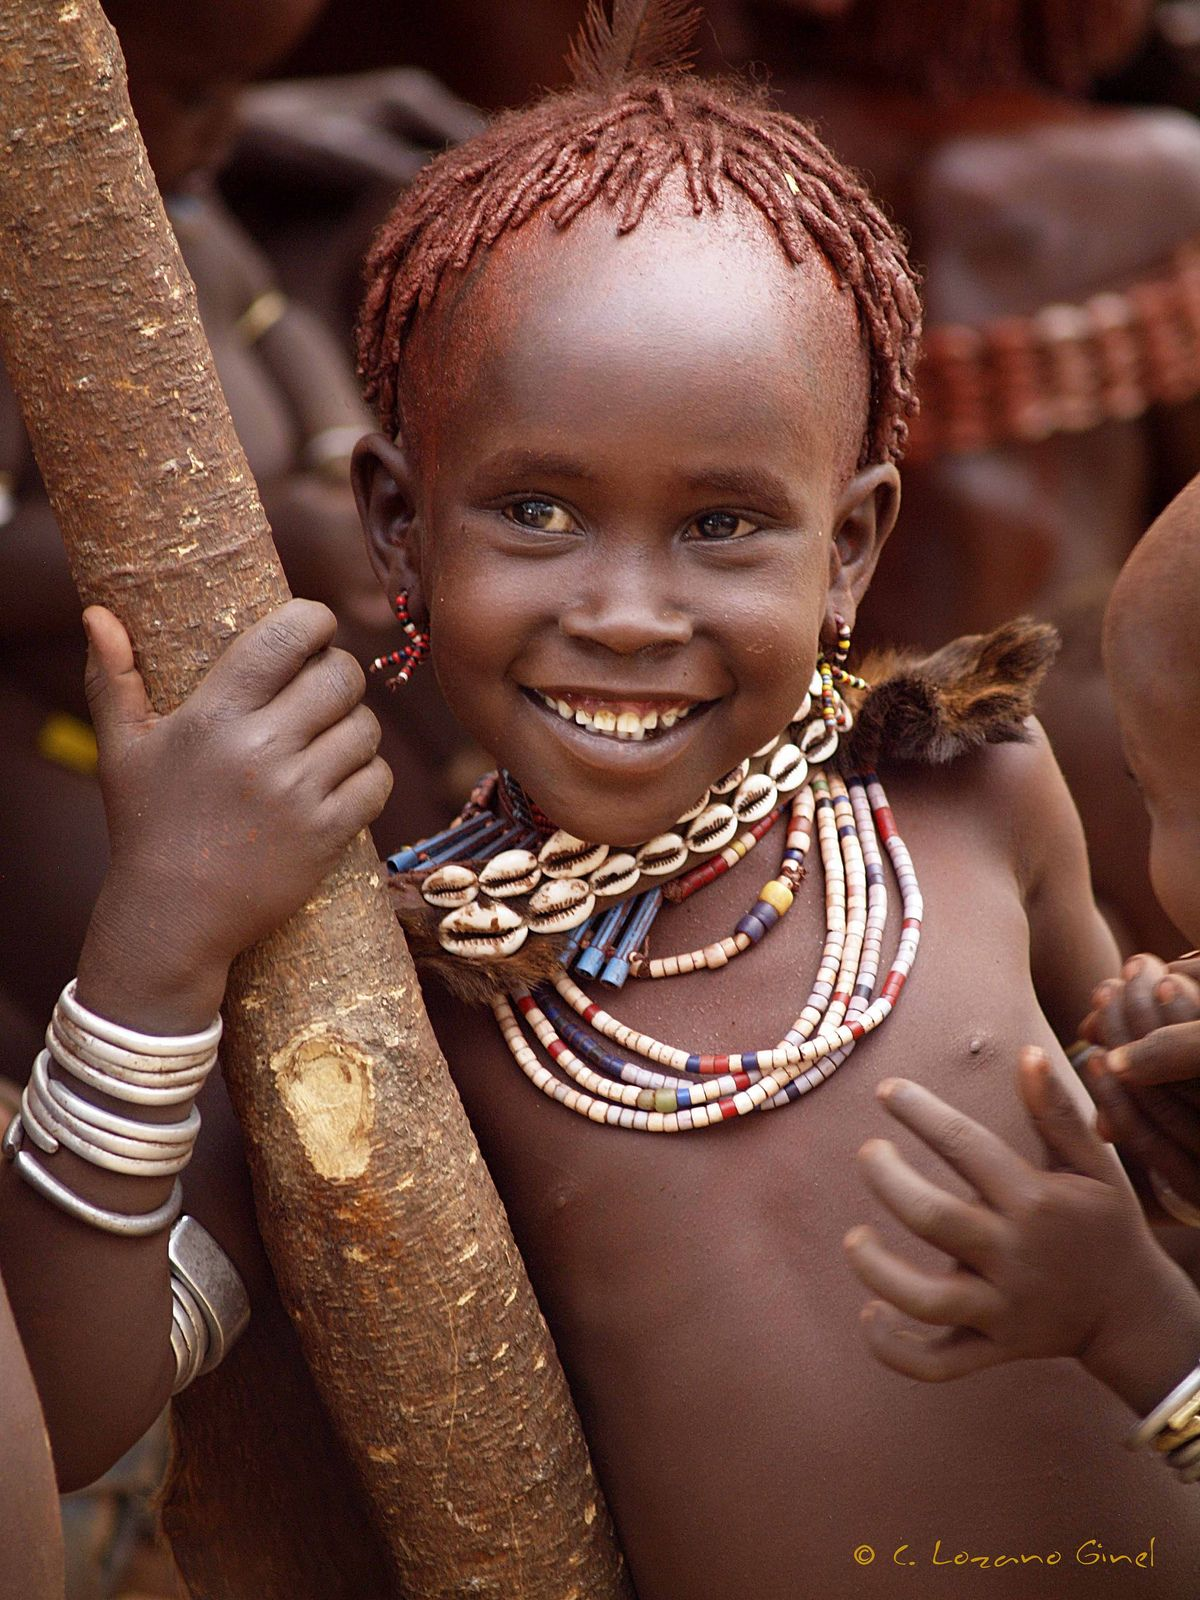 Melting hearts with a sincere smile   Hamar girl in Ukuli Bula.  Ethiopia   Africa©Carlos Lozano Ginel